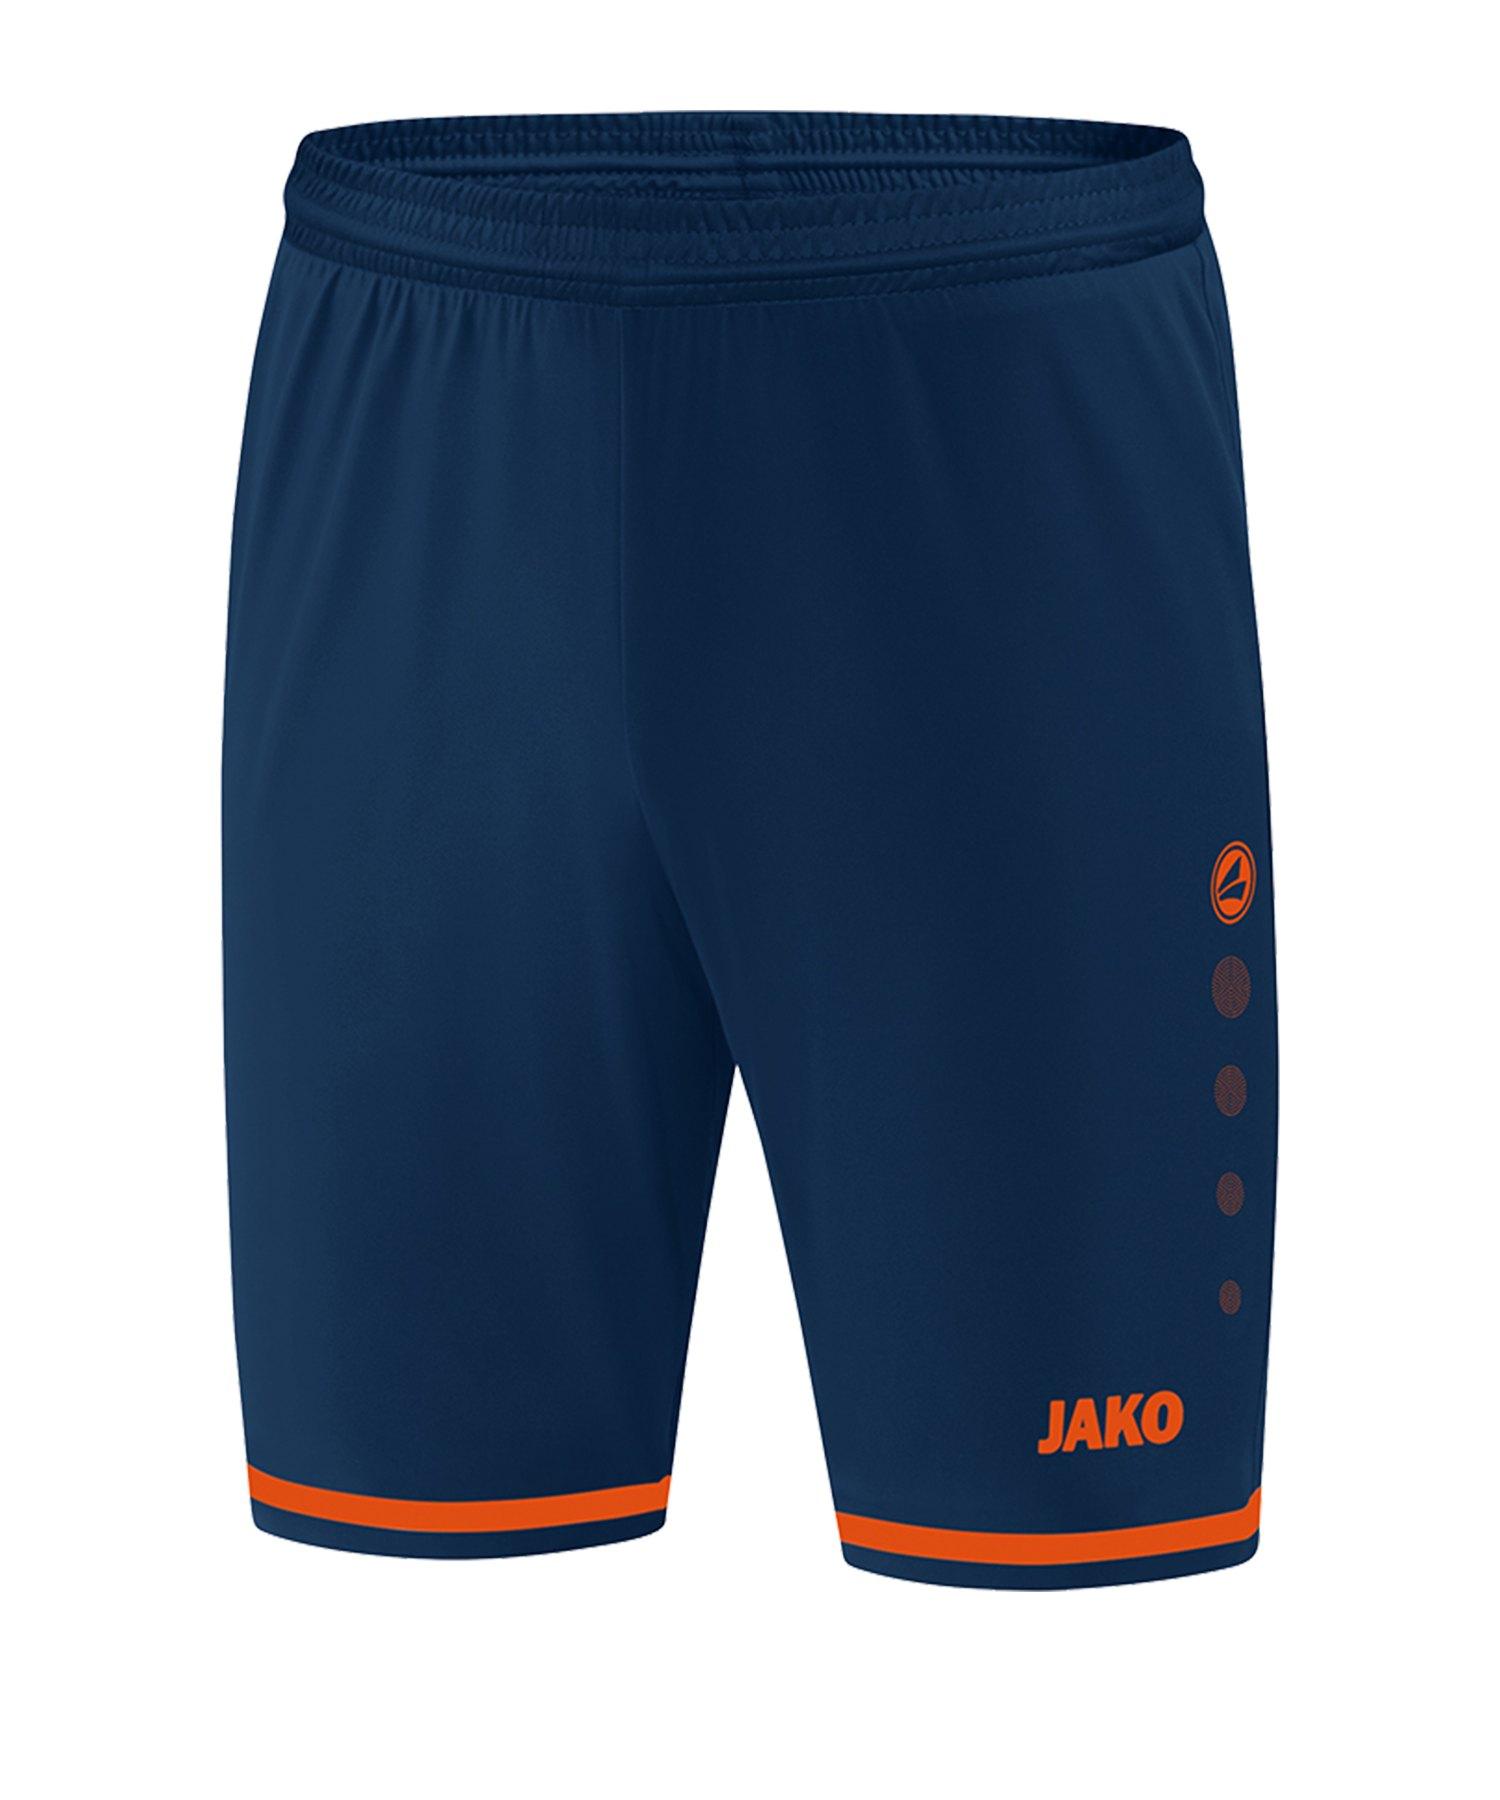 Jako Striker 2.0 Short Hose kurz Blau Orange F18 - Blau